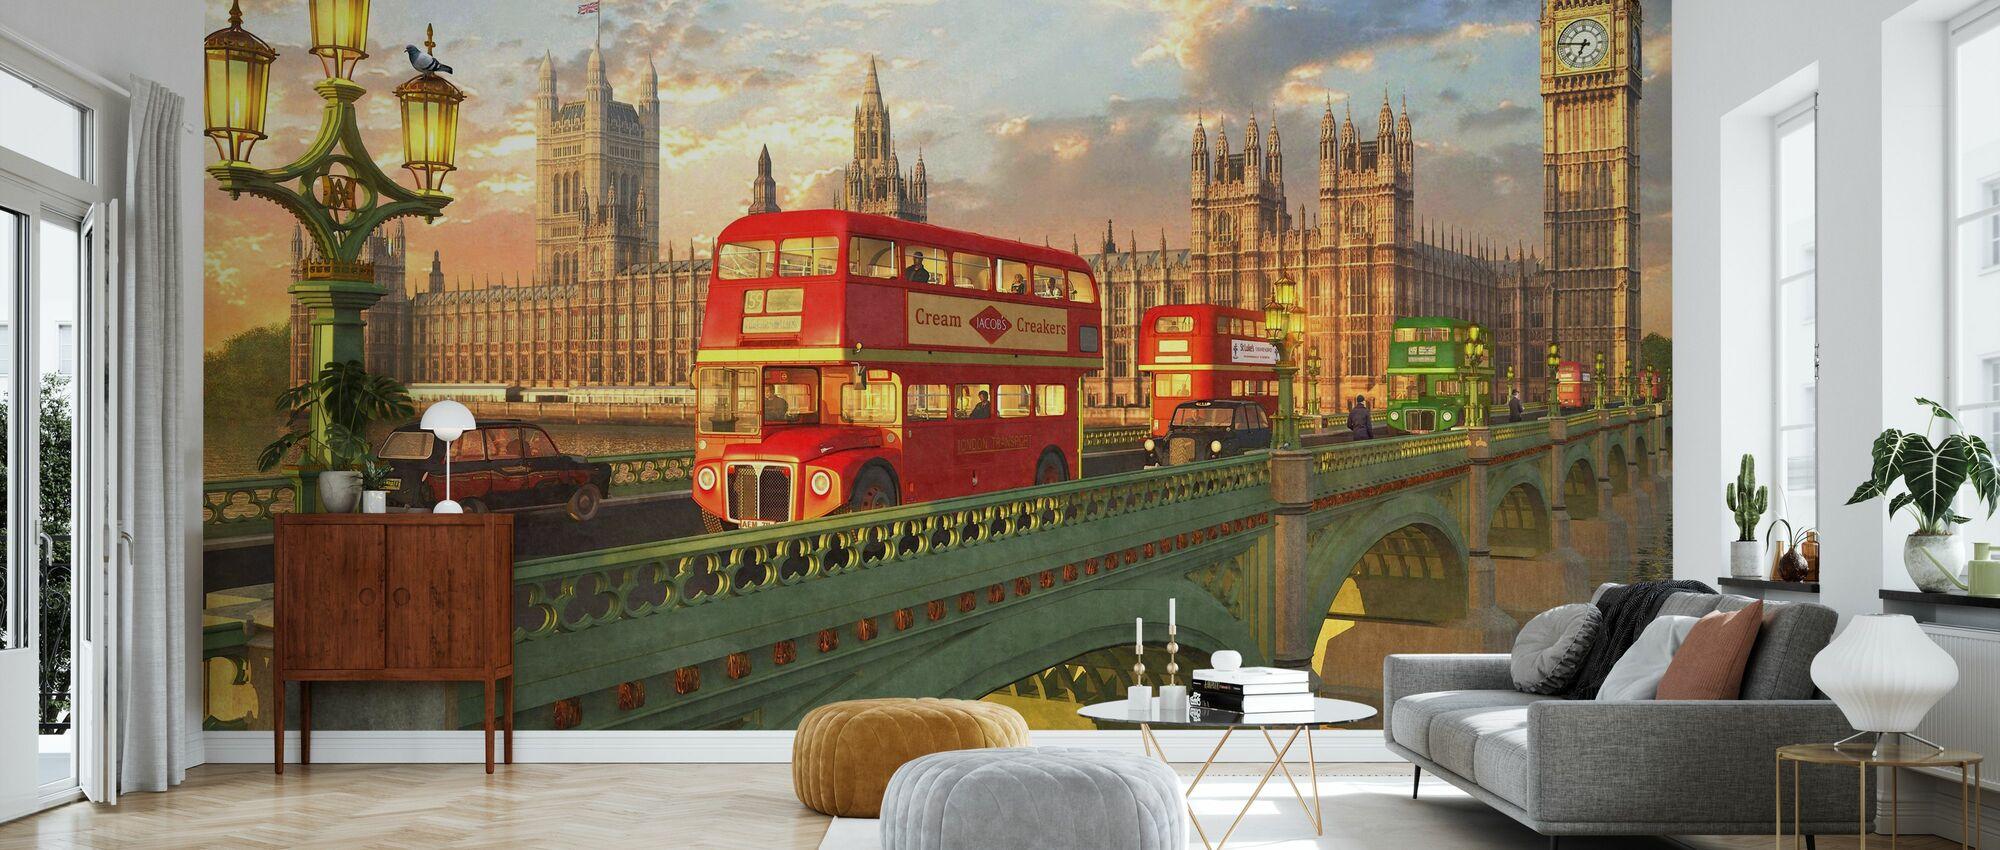 Westminster Bridge Bussar - Tapet - Stue